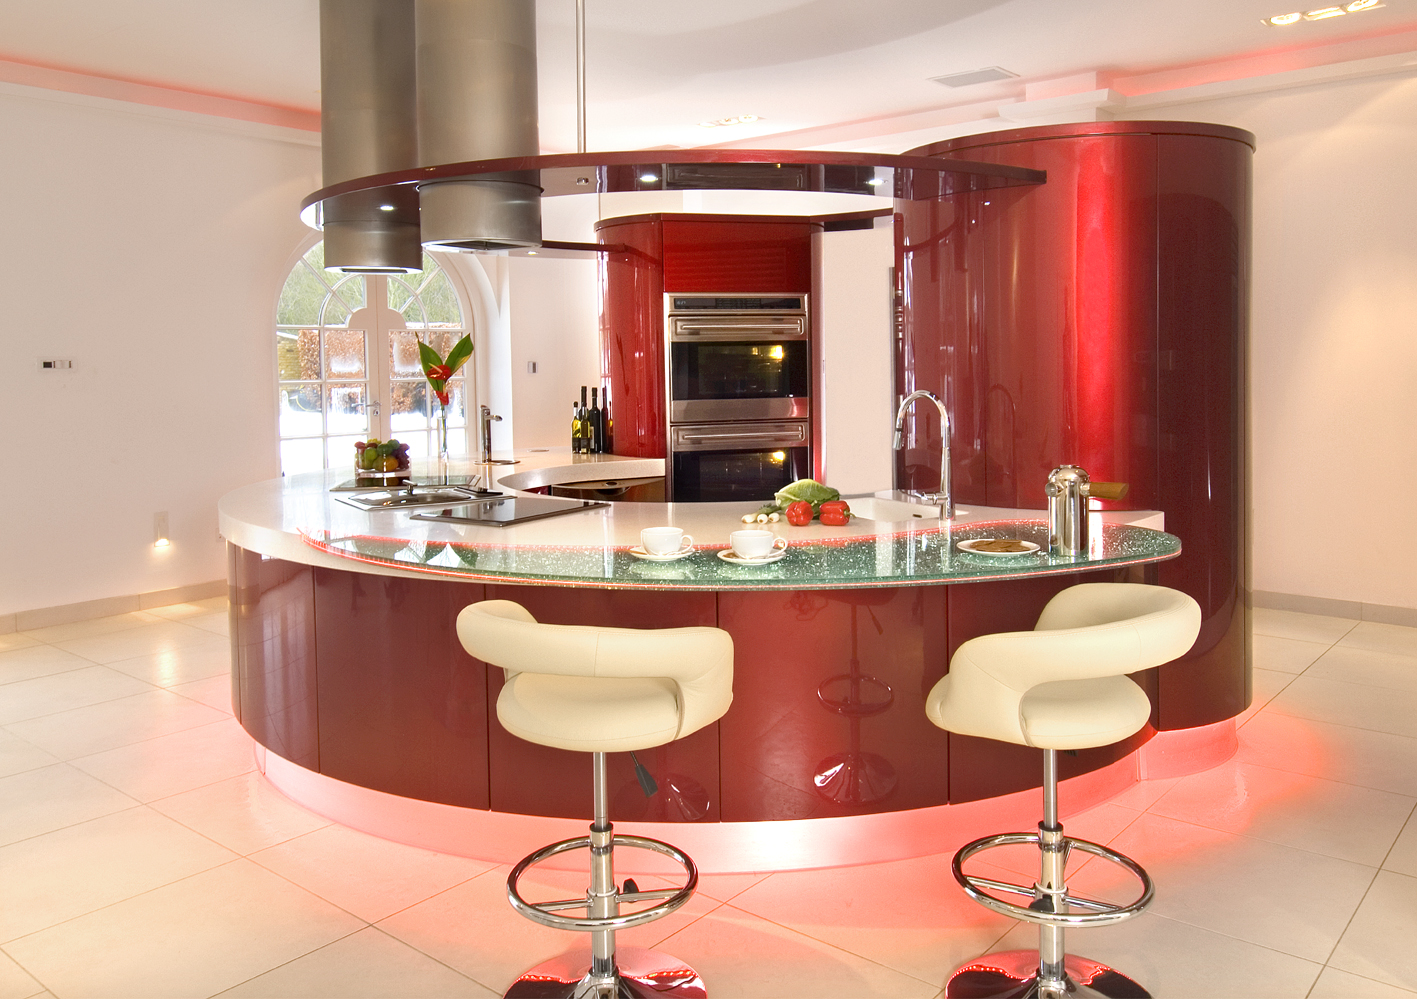 Sub zero wolf present the 2010 2012 kitchen design contest - Kitchen design competition ...